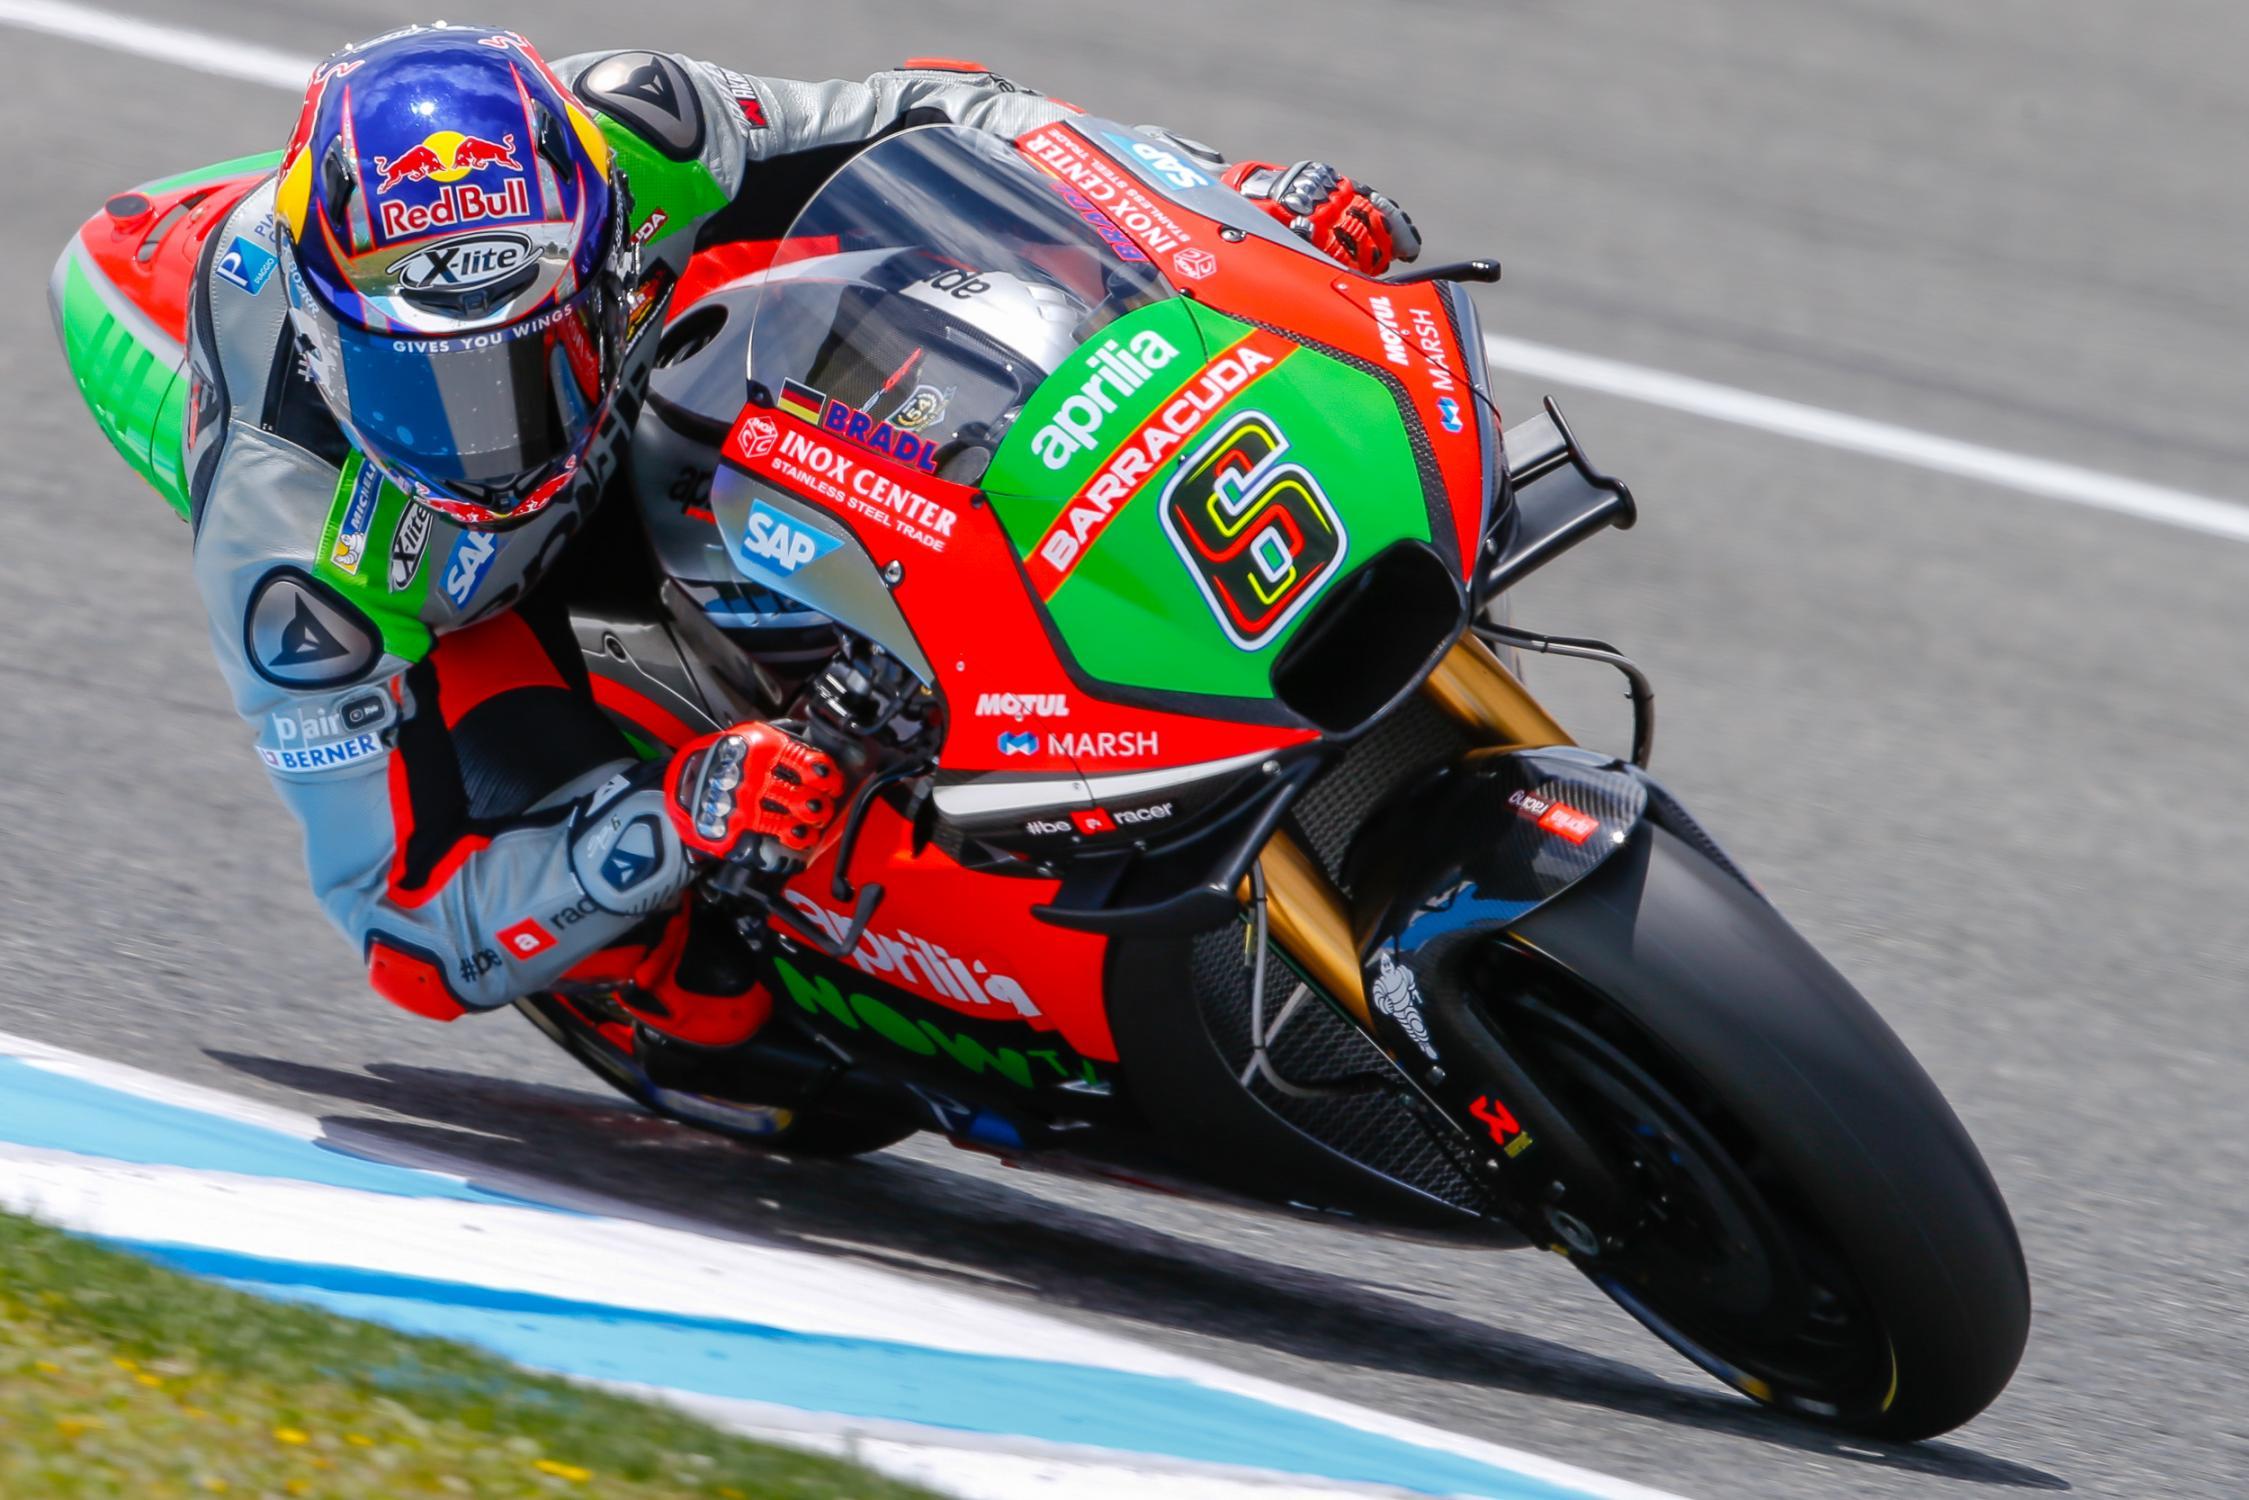 [GP] Jerez 06-stefan-bradl-ger_gp_0313.gallery_full_top_fullscreen